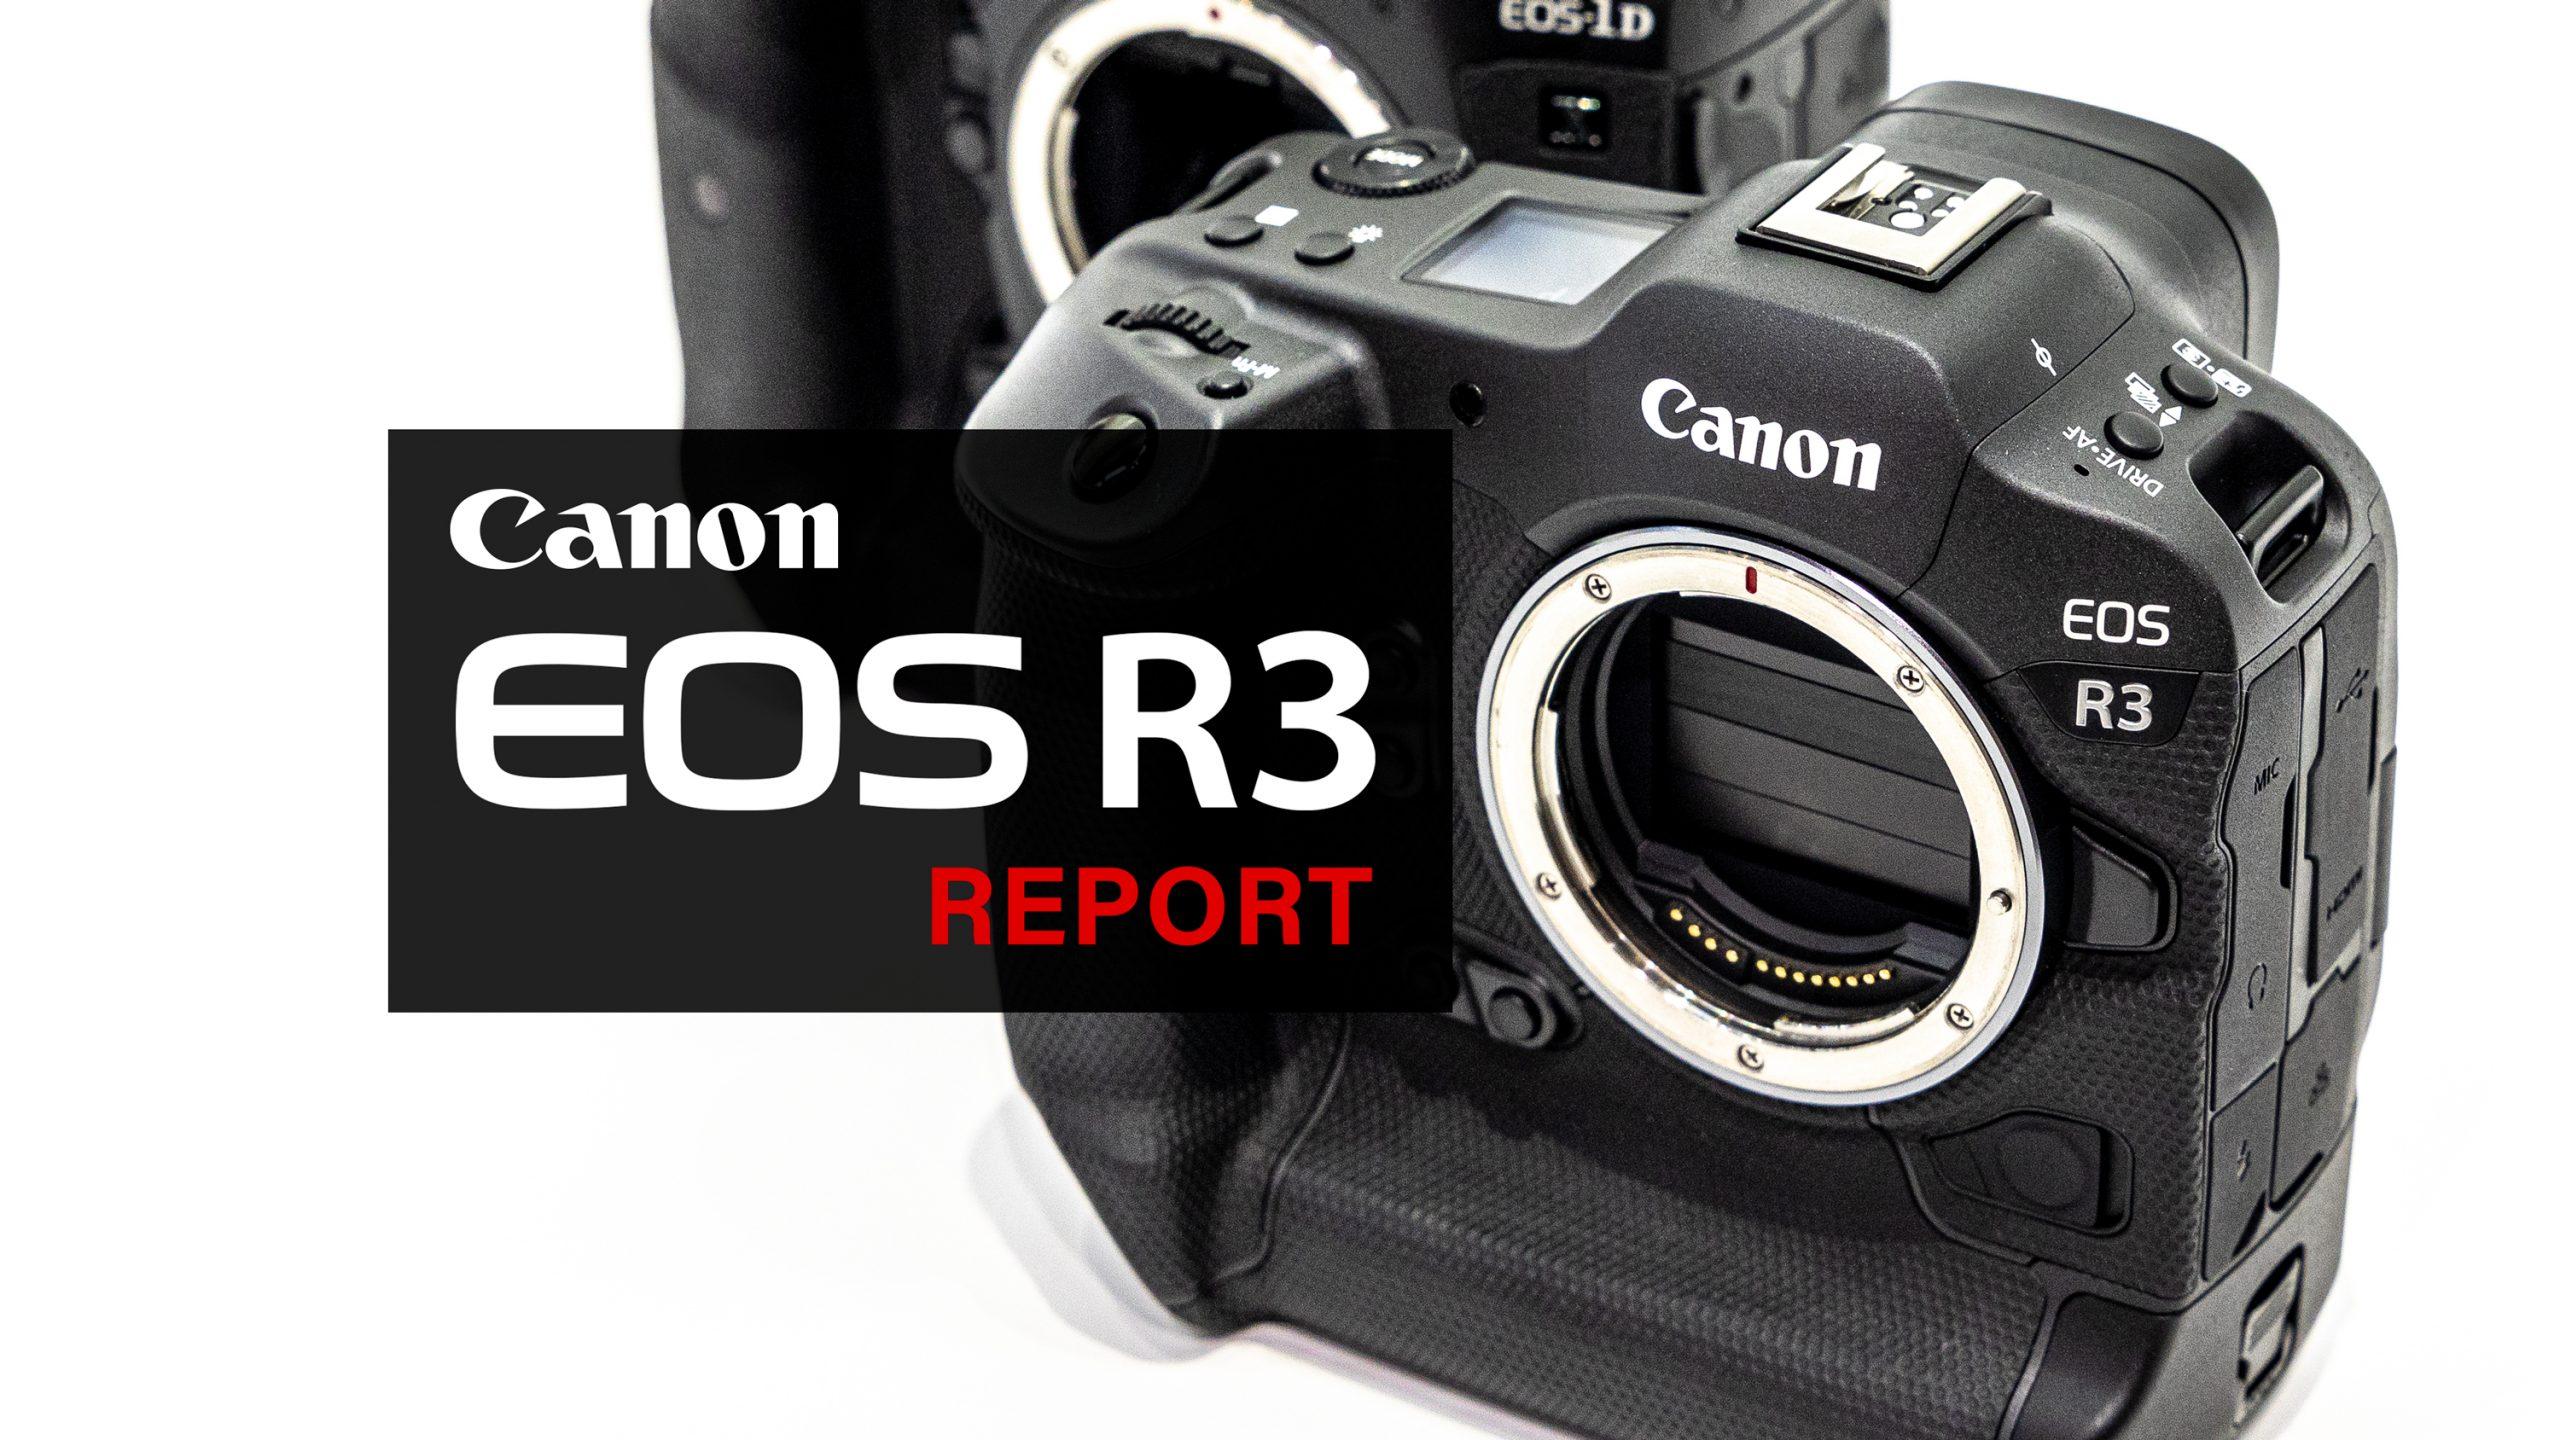 【Canon】EOS R3 先行展示 体験レポート